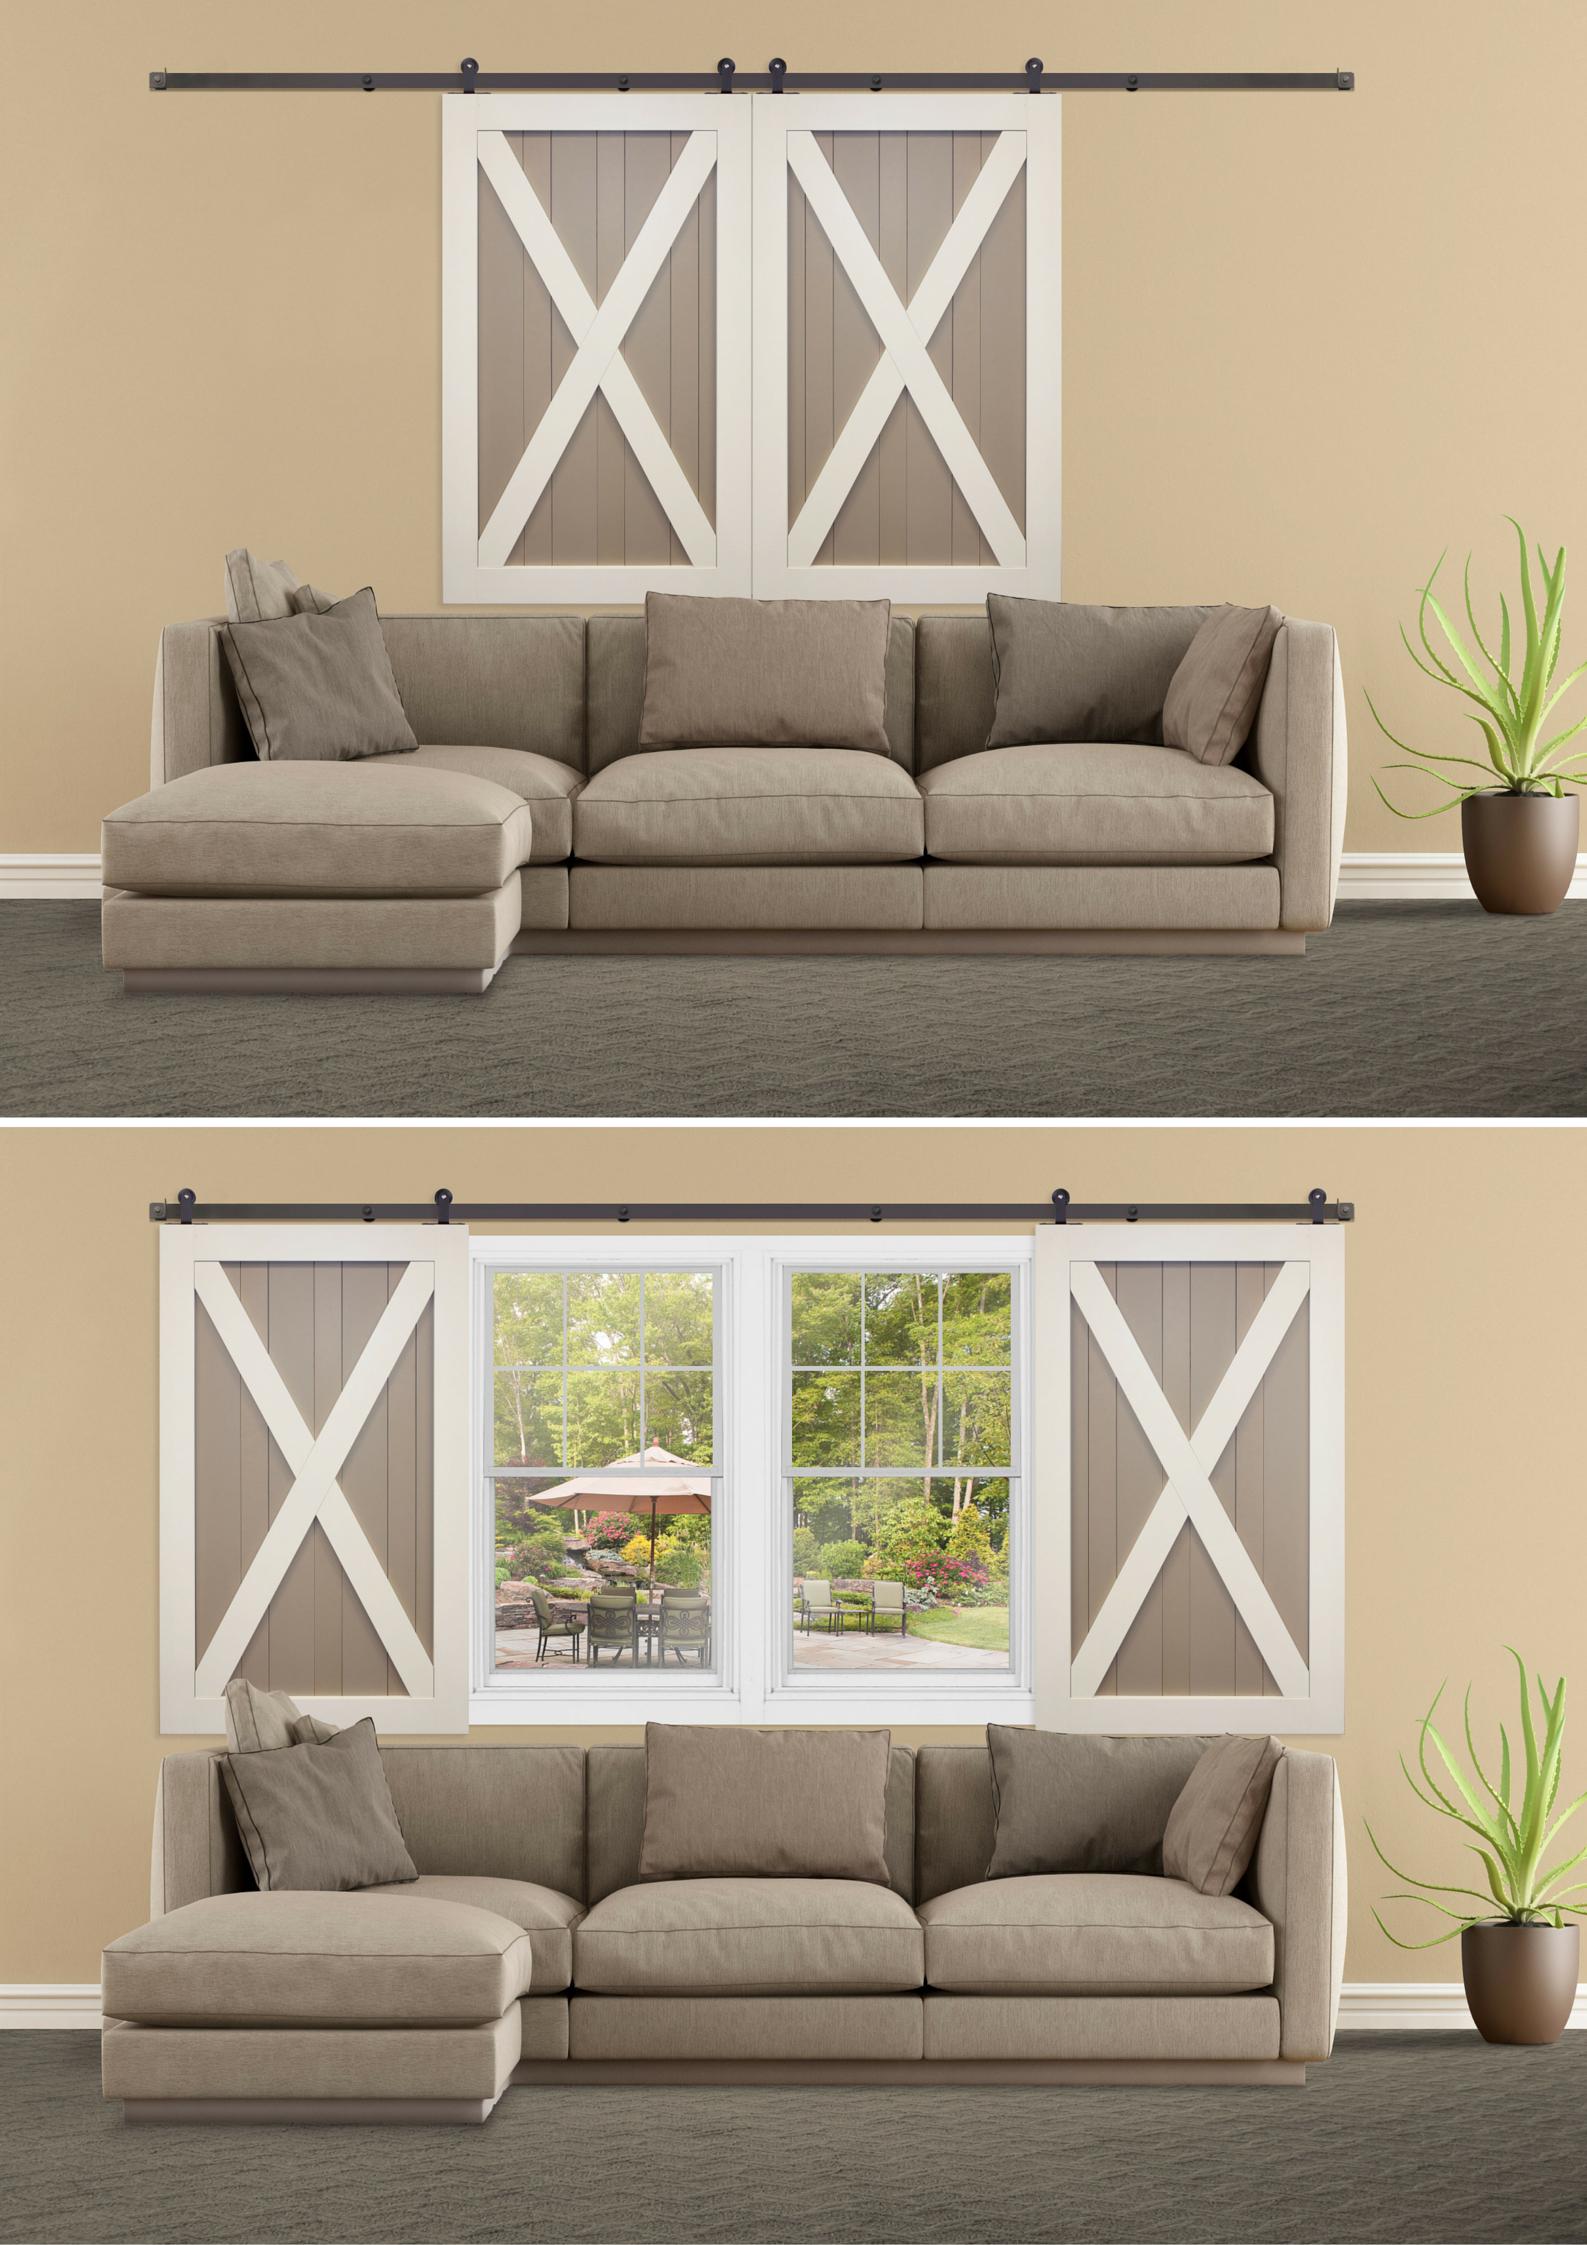 17 most popular bonus room ideas designs styles for Shutter window treatment ideas